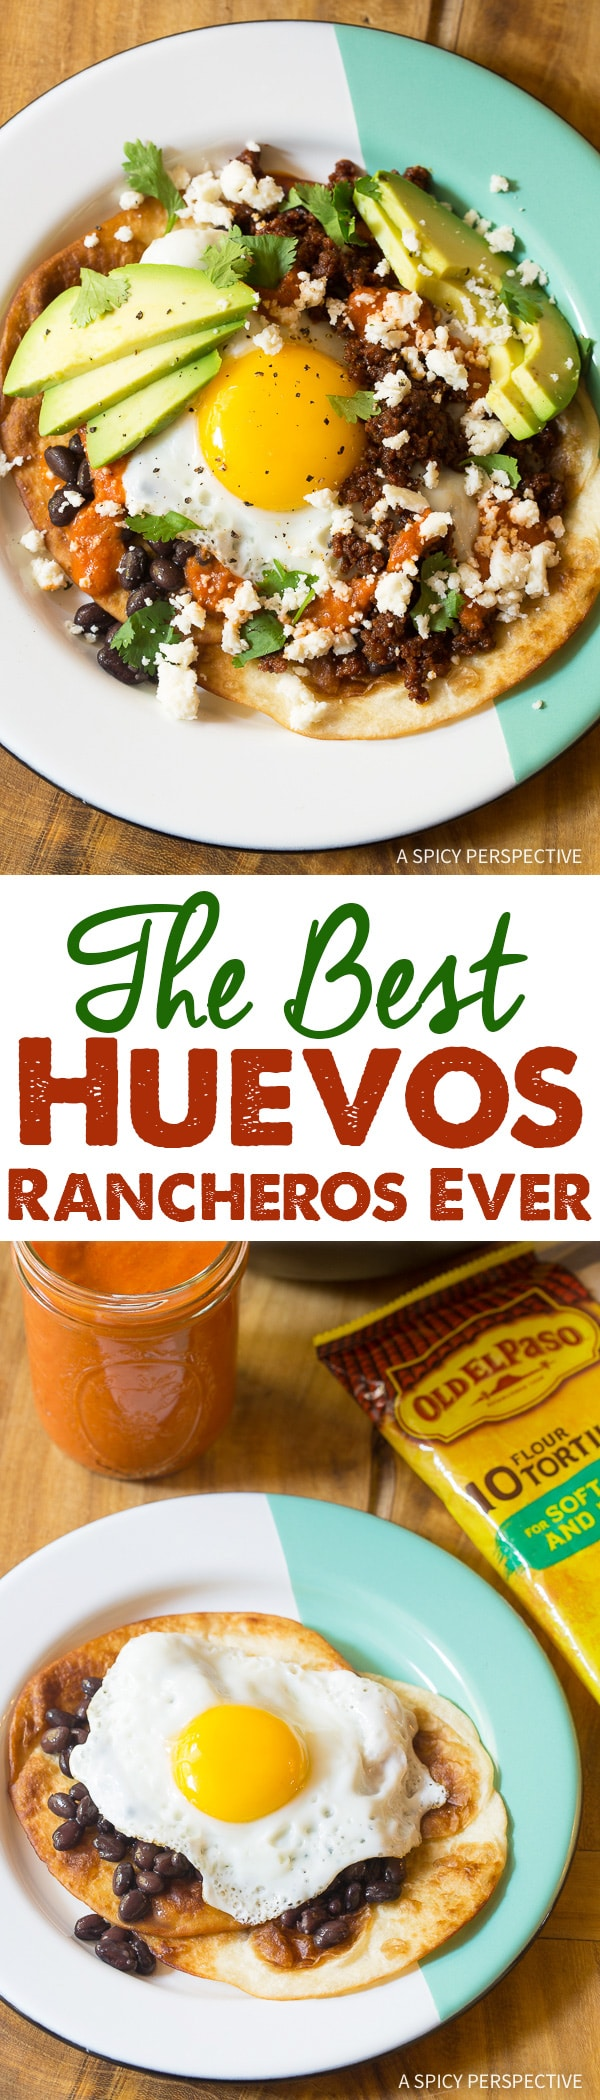 The Best Huevos Rancheros Recipe Ever!